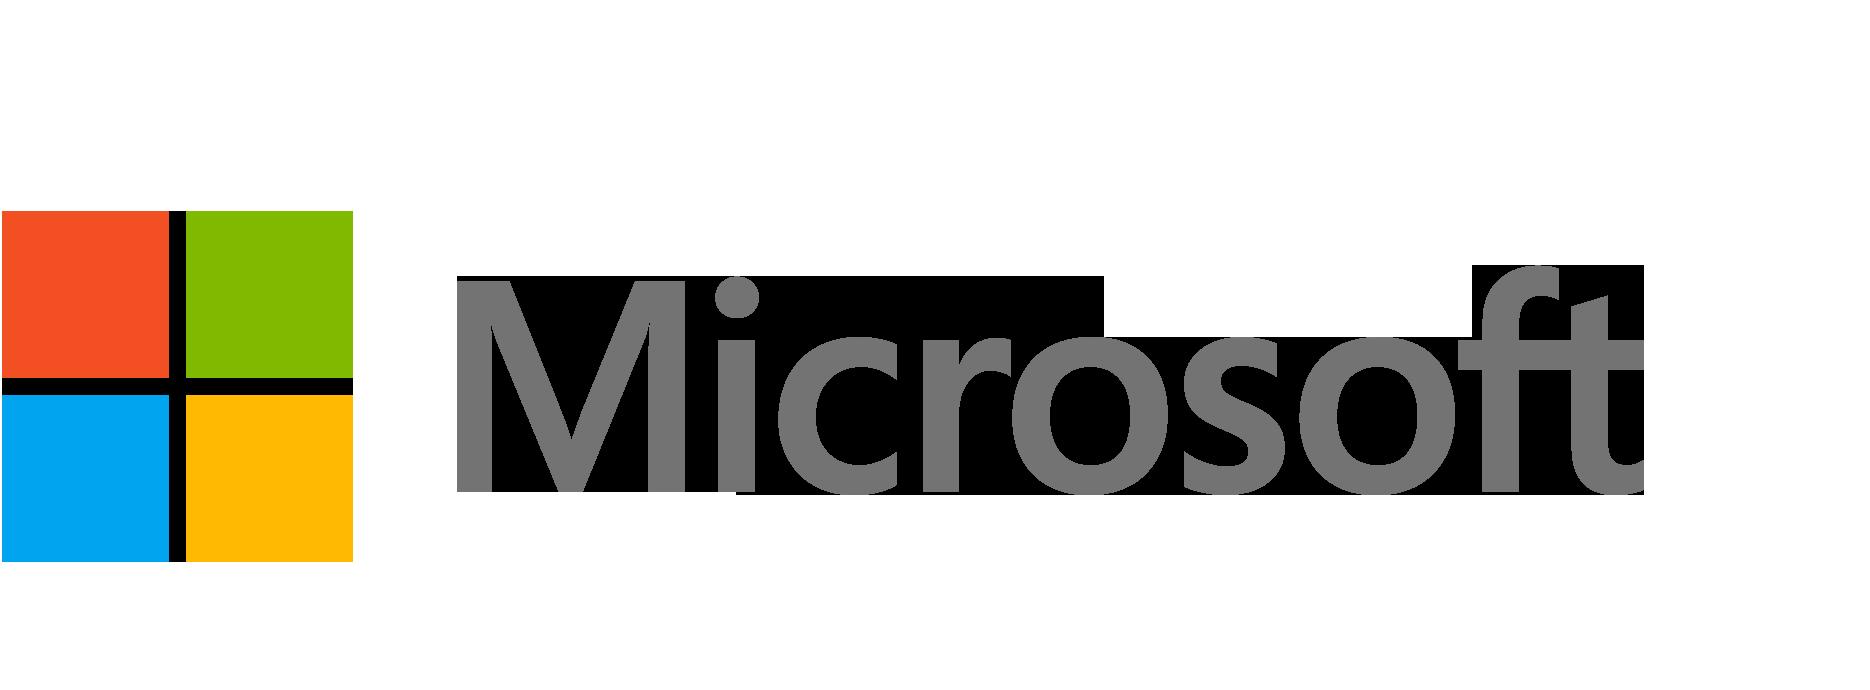 microsoft-logo-png.png